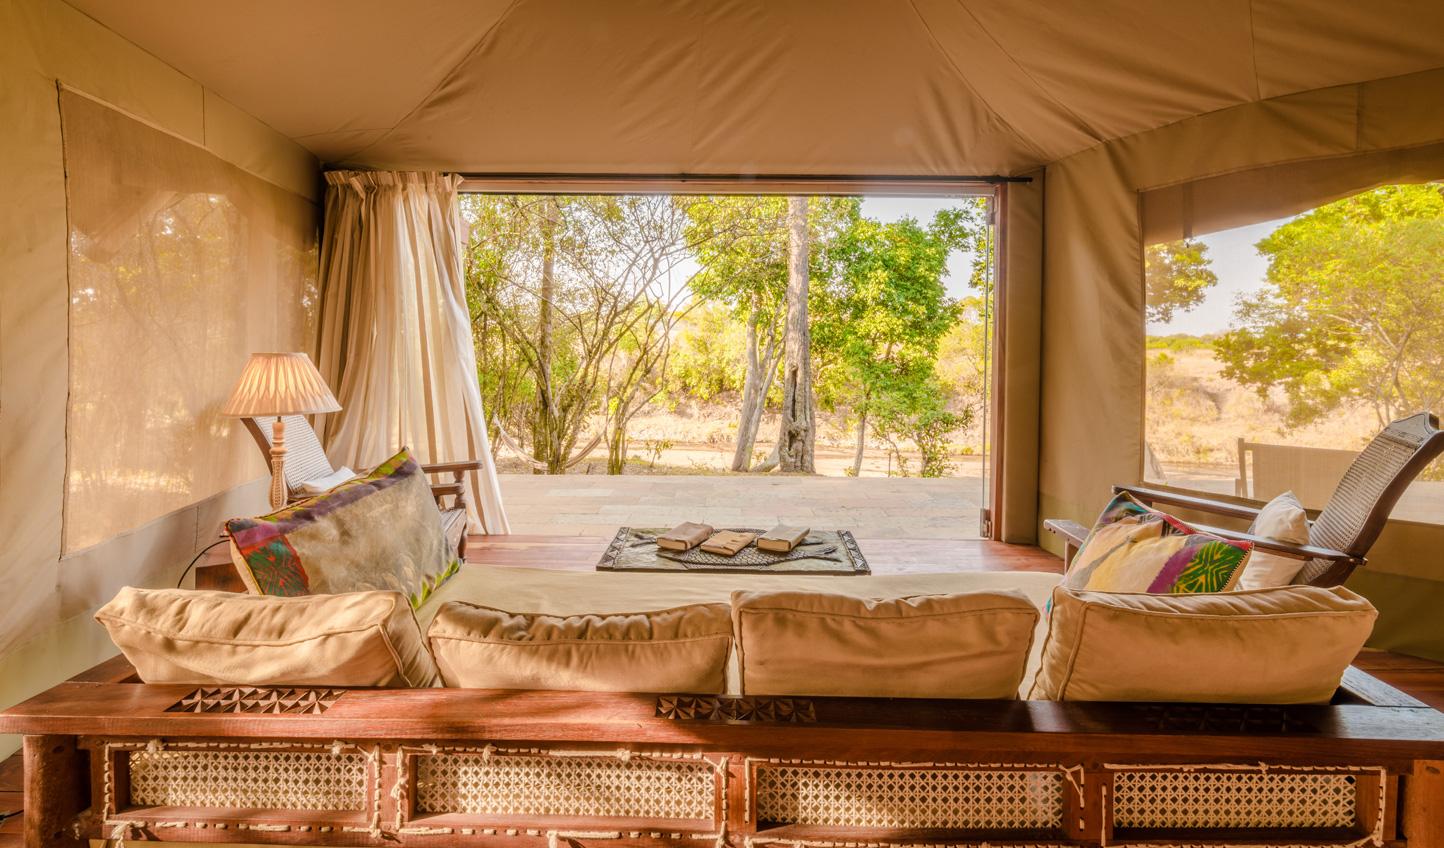 Views over the Maasai Mara